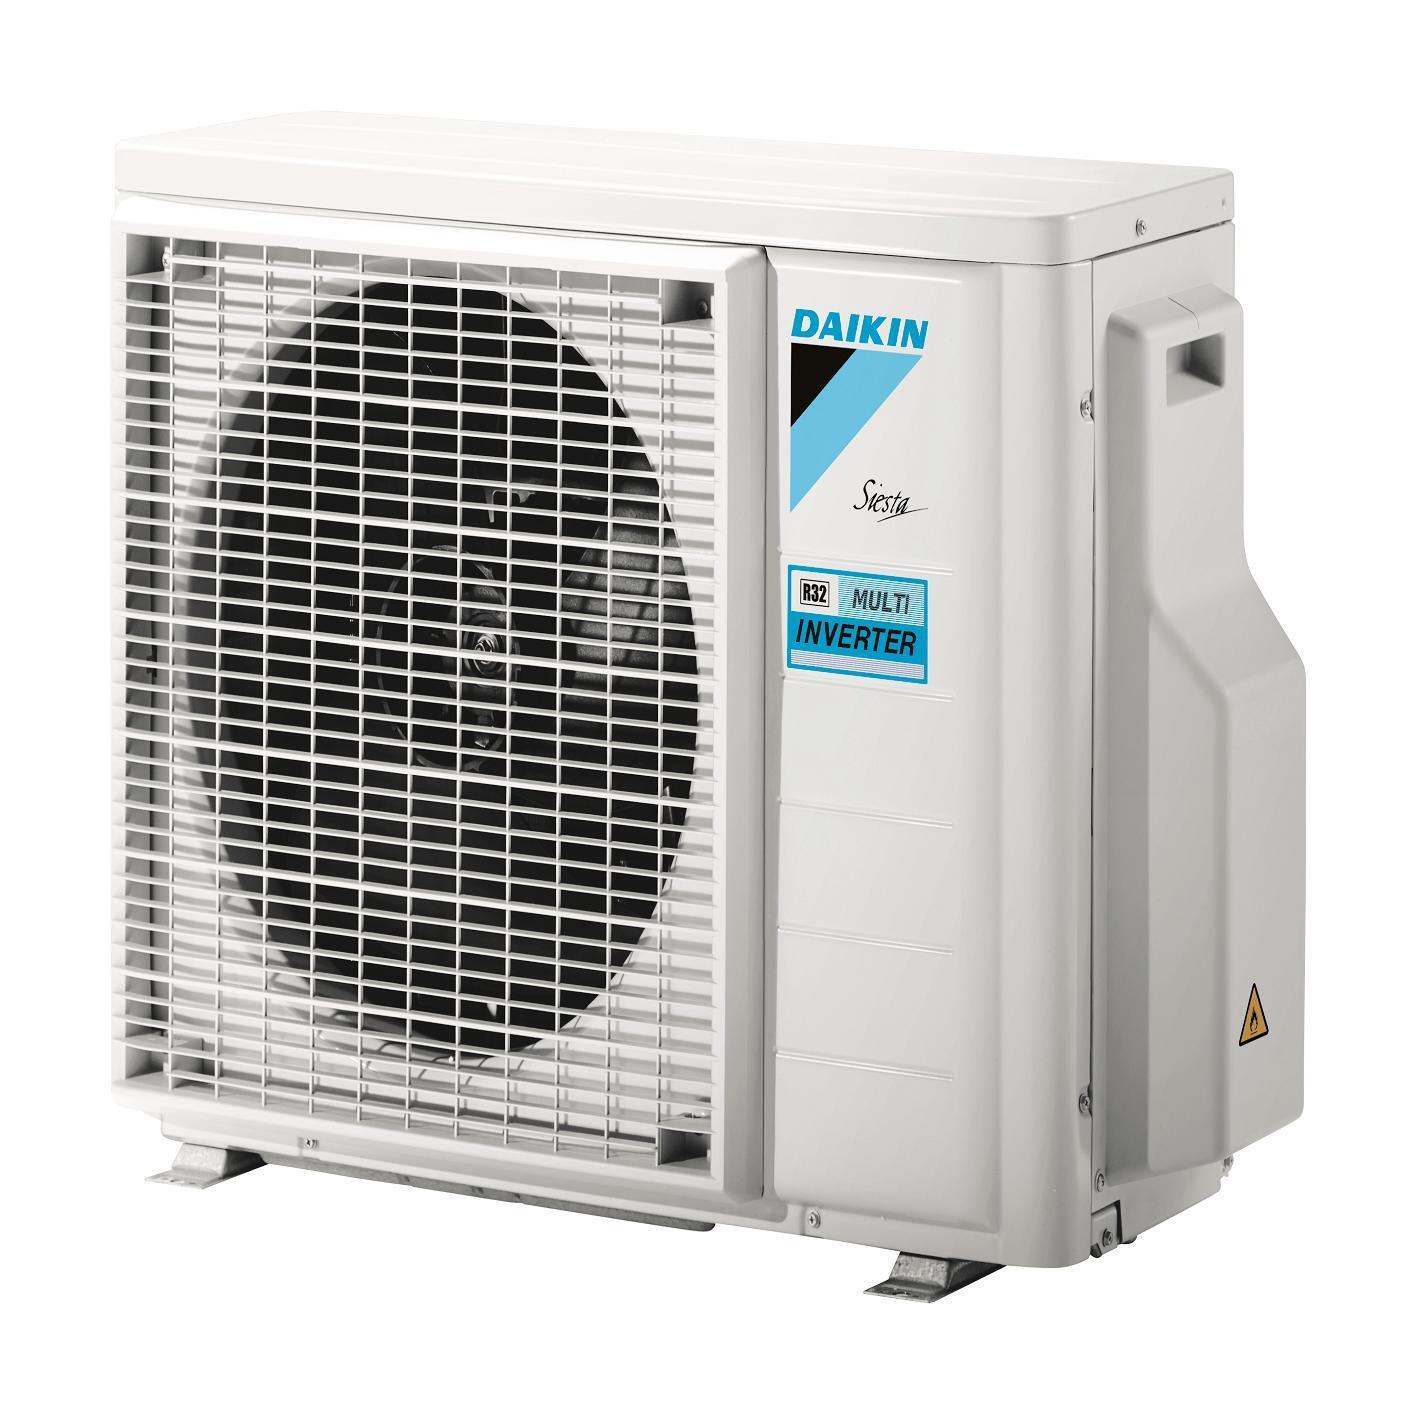 Climatizzatore dualsplit DAIKIN ATXF 13648 BTU - 2